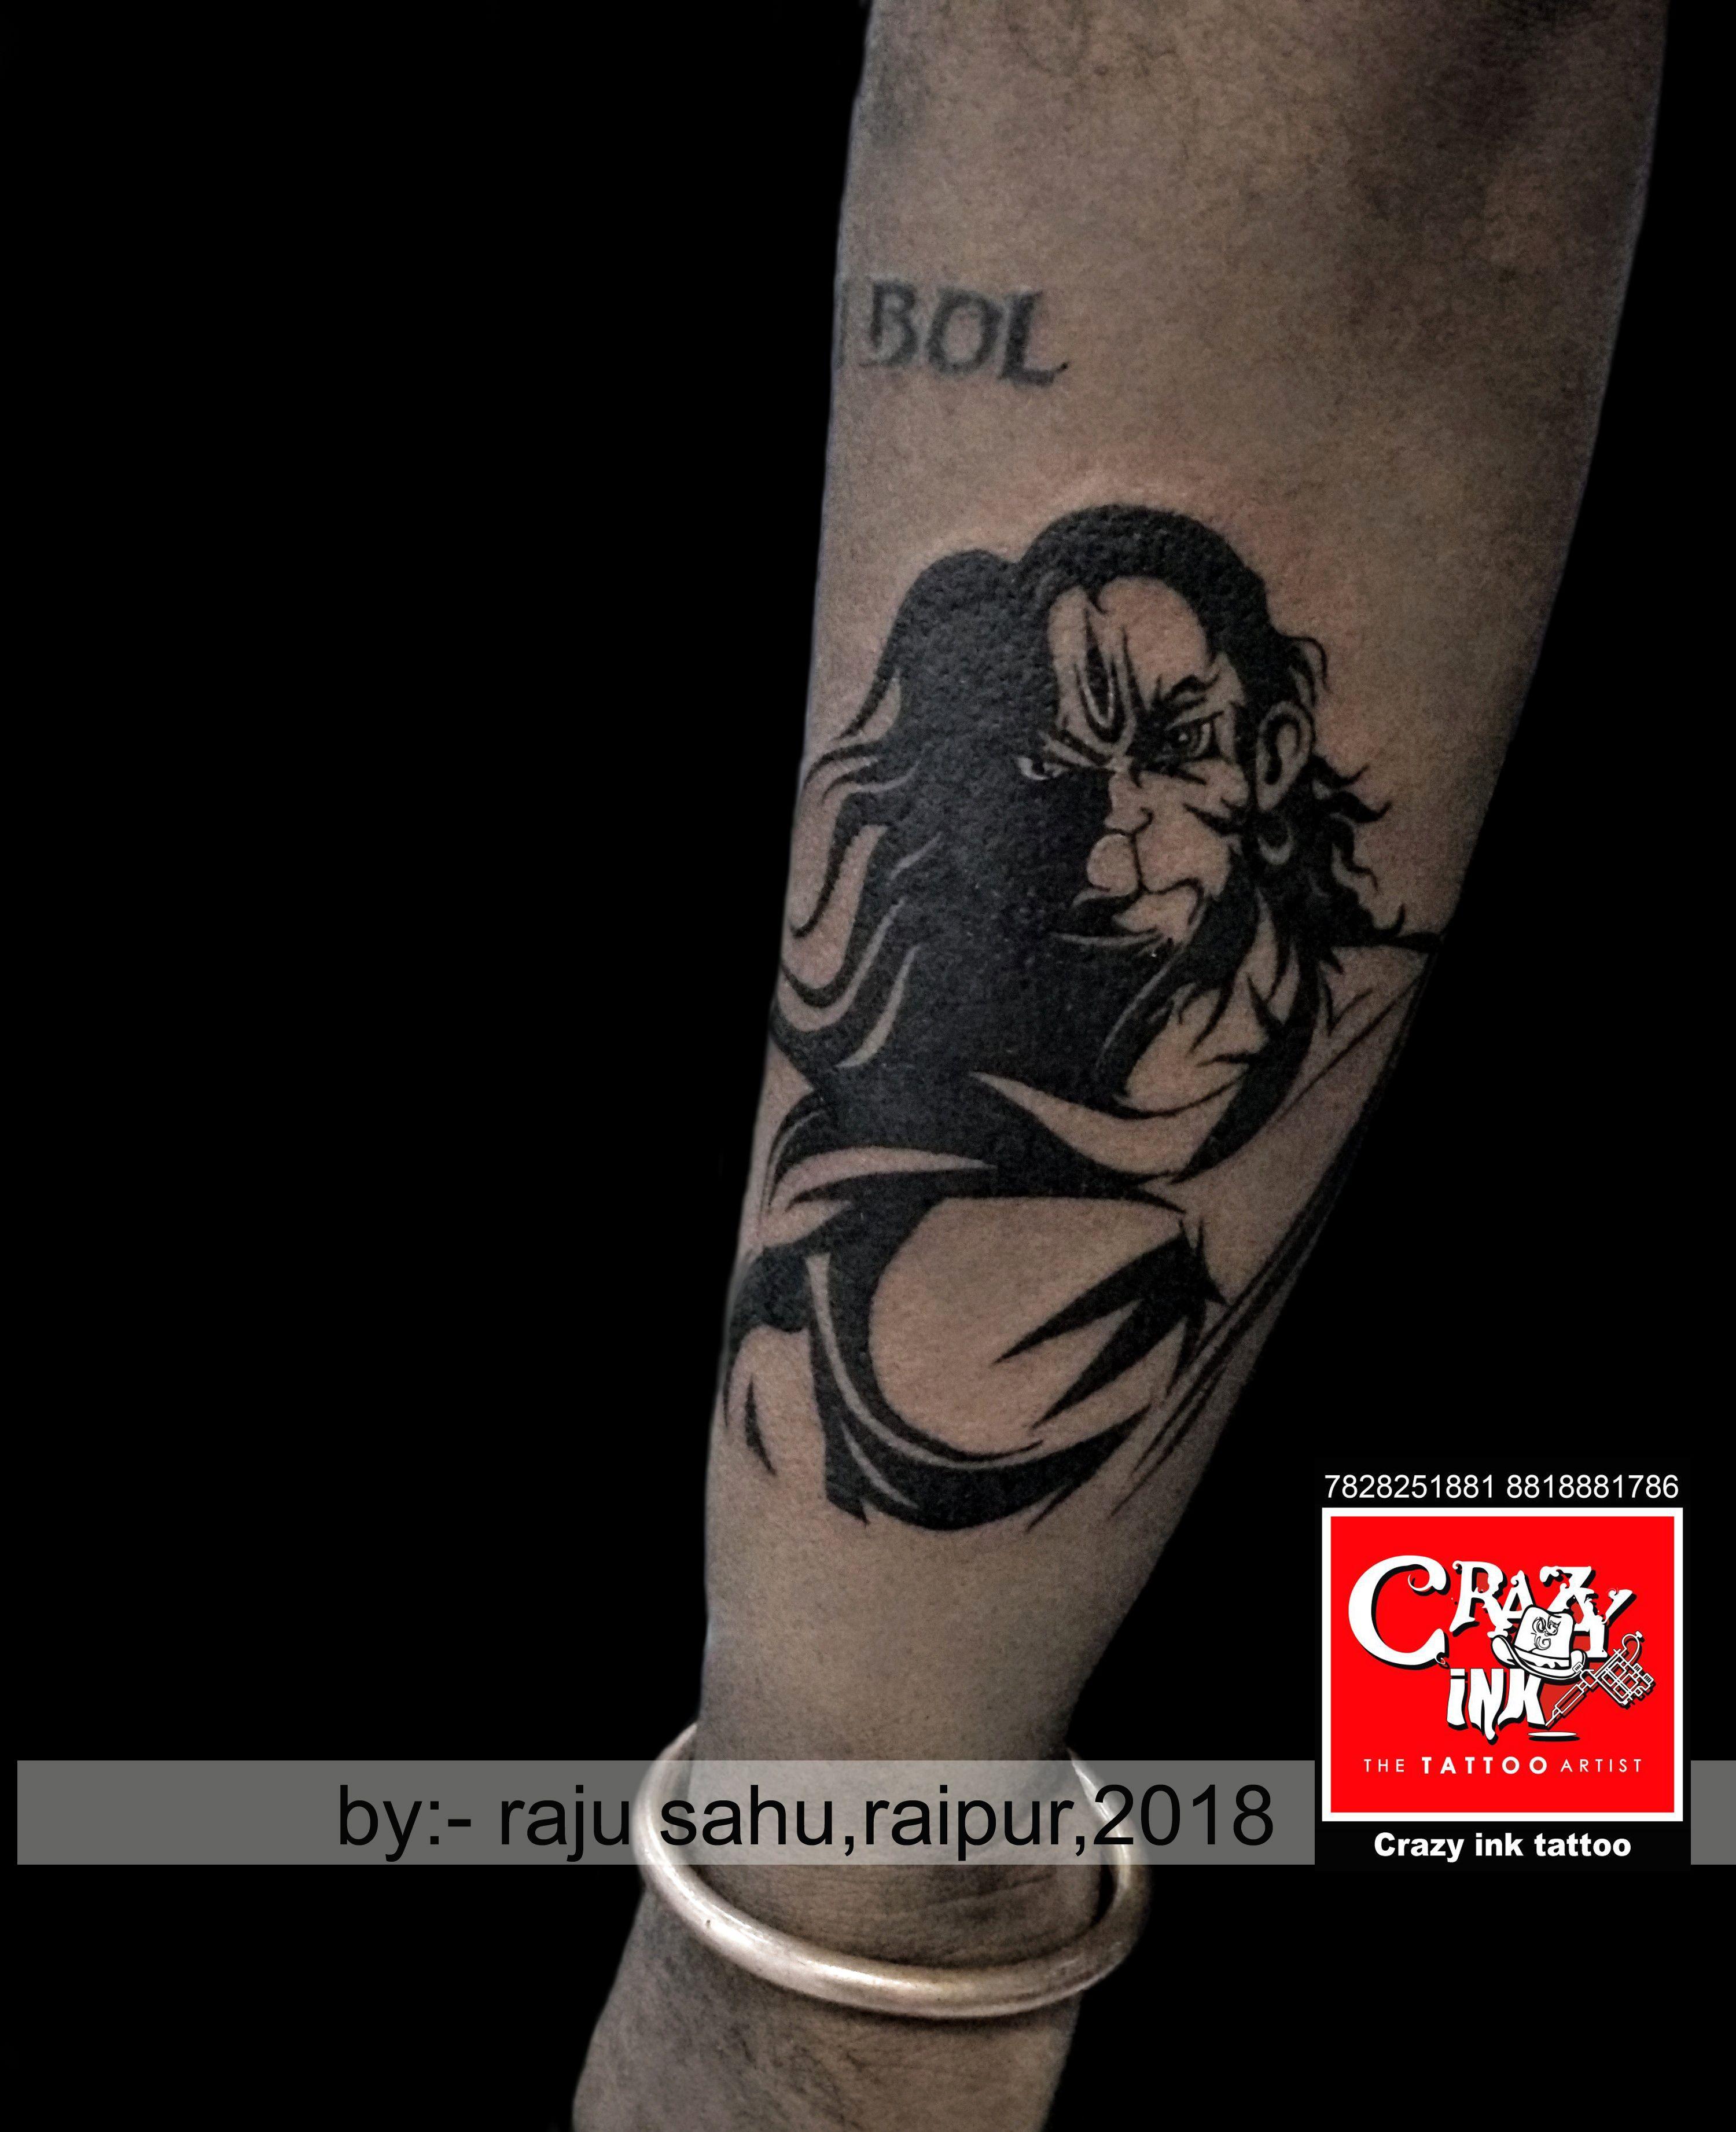 Lord Hanuman Tattoo Hanumantattoo Lord Hanuman Tattoo Raipurartist Crazyinktattoo Hanuman Tattoo Alien Tattoo Tattoos For Guys Hanuman tattoo hd wallpaper